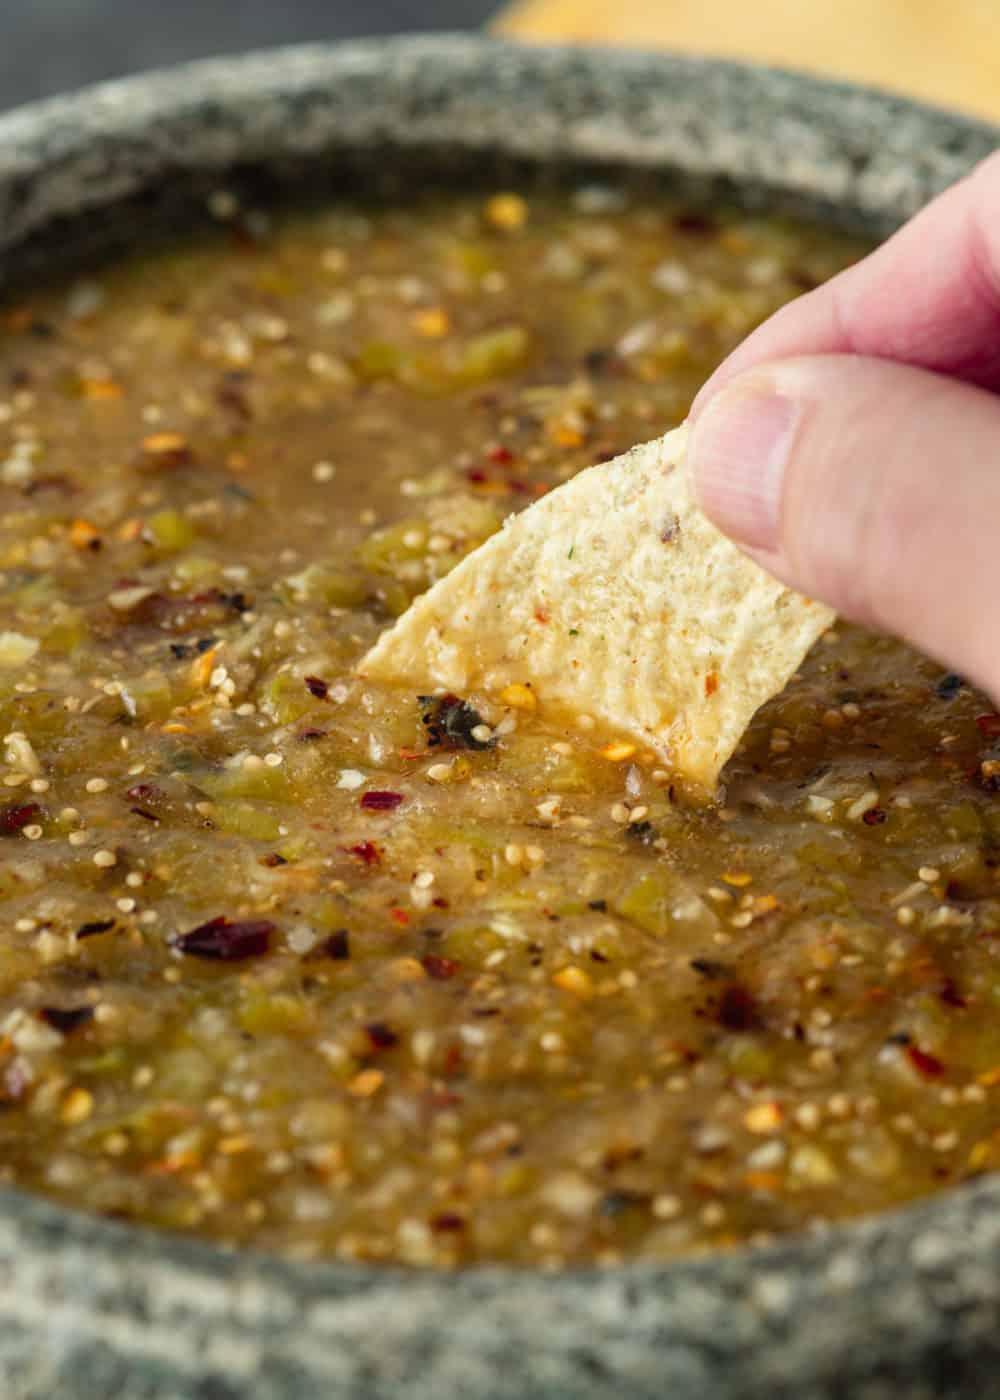 dipping tortilla chip into bowl of spicy tomatillo salsa